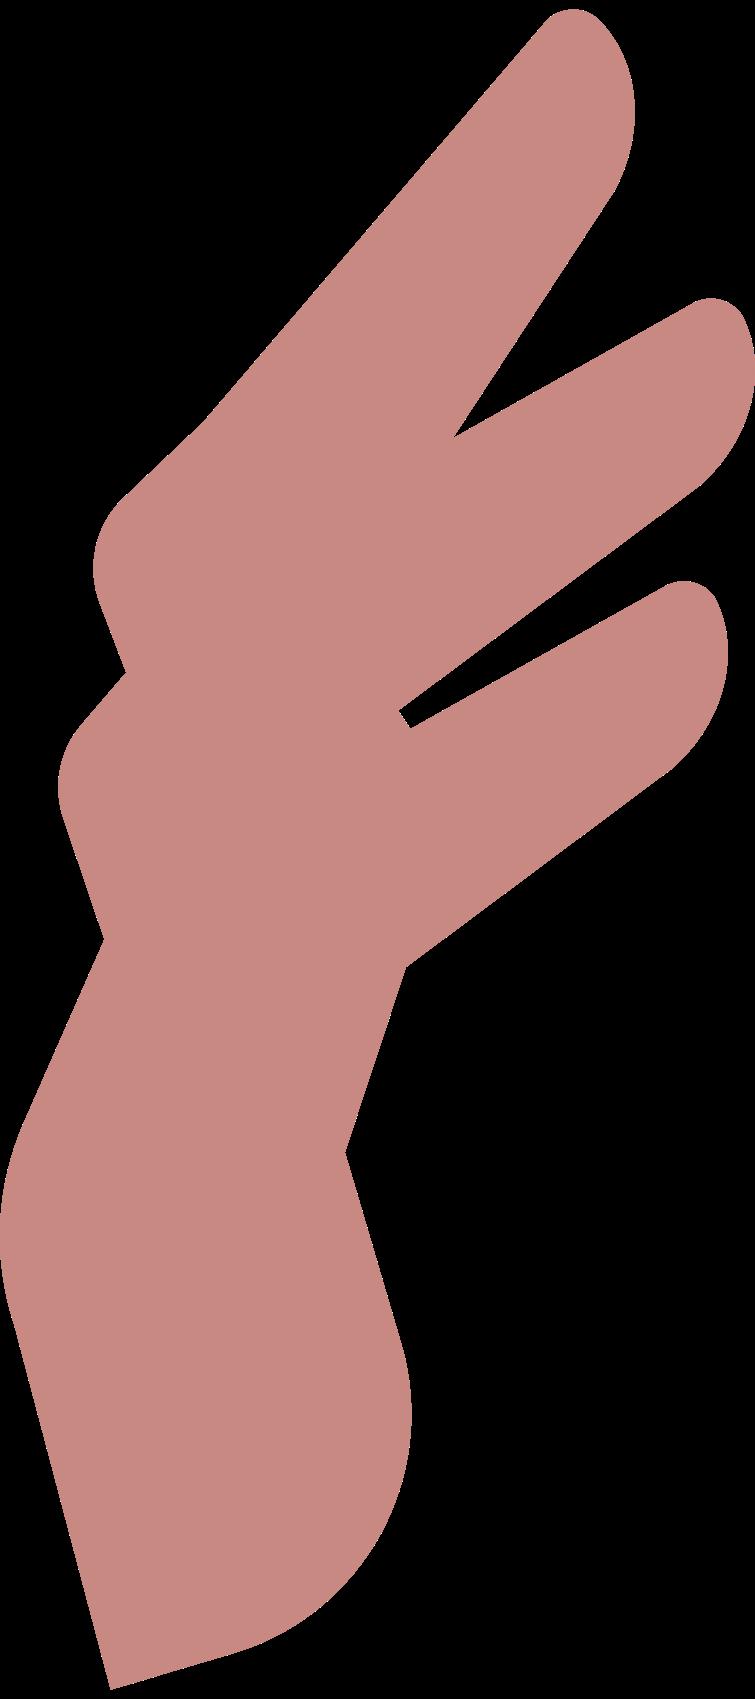 Ilustración de clipart de order completed  man 4 fingers en PNG, SVG